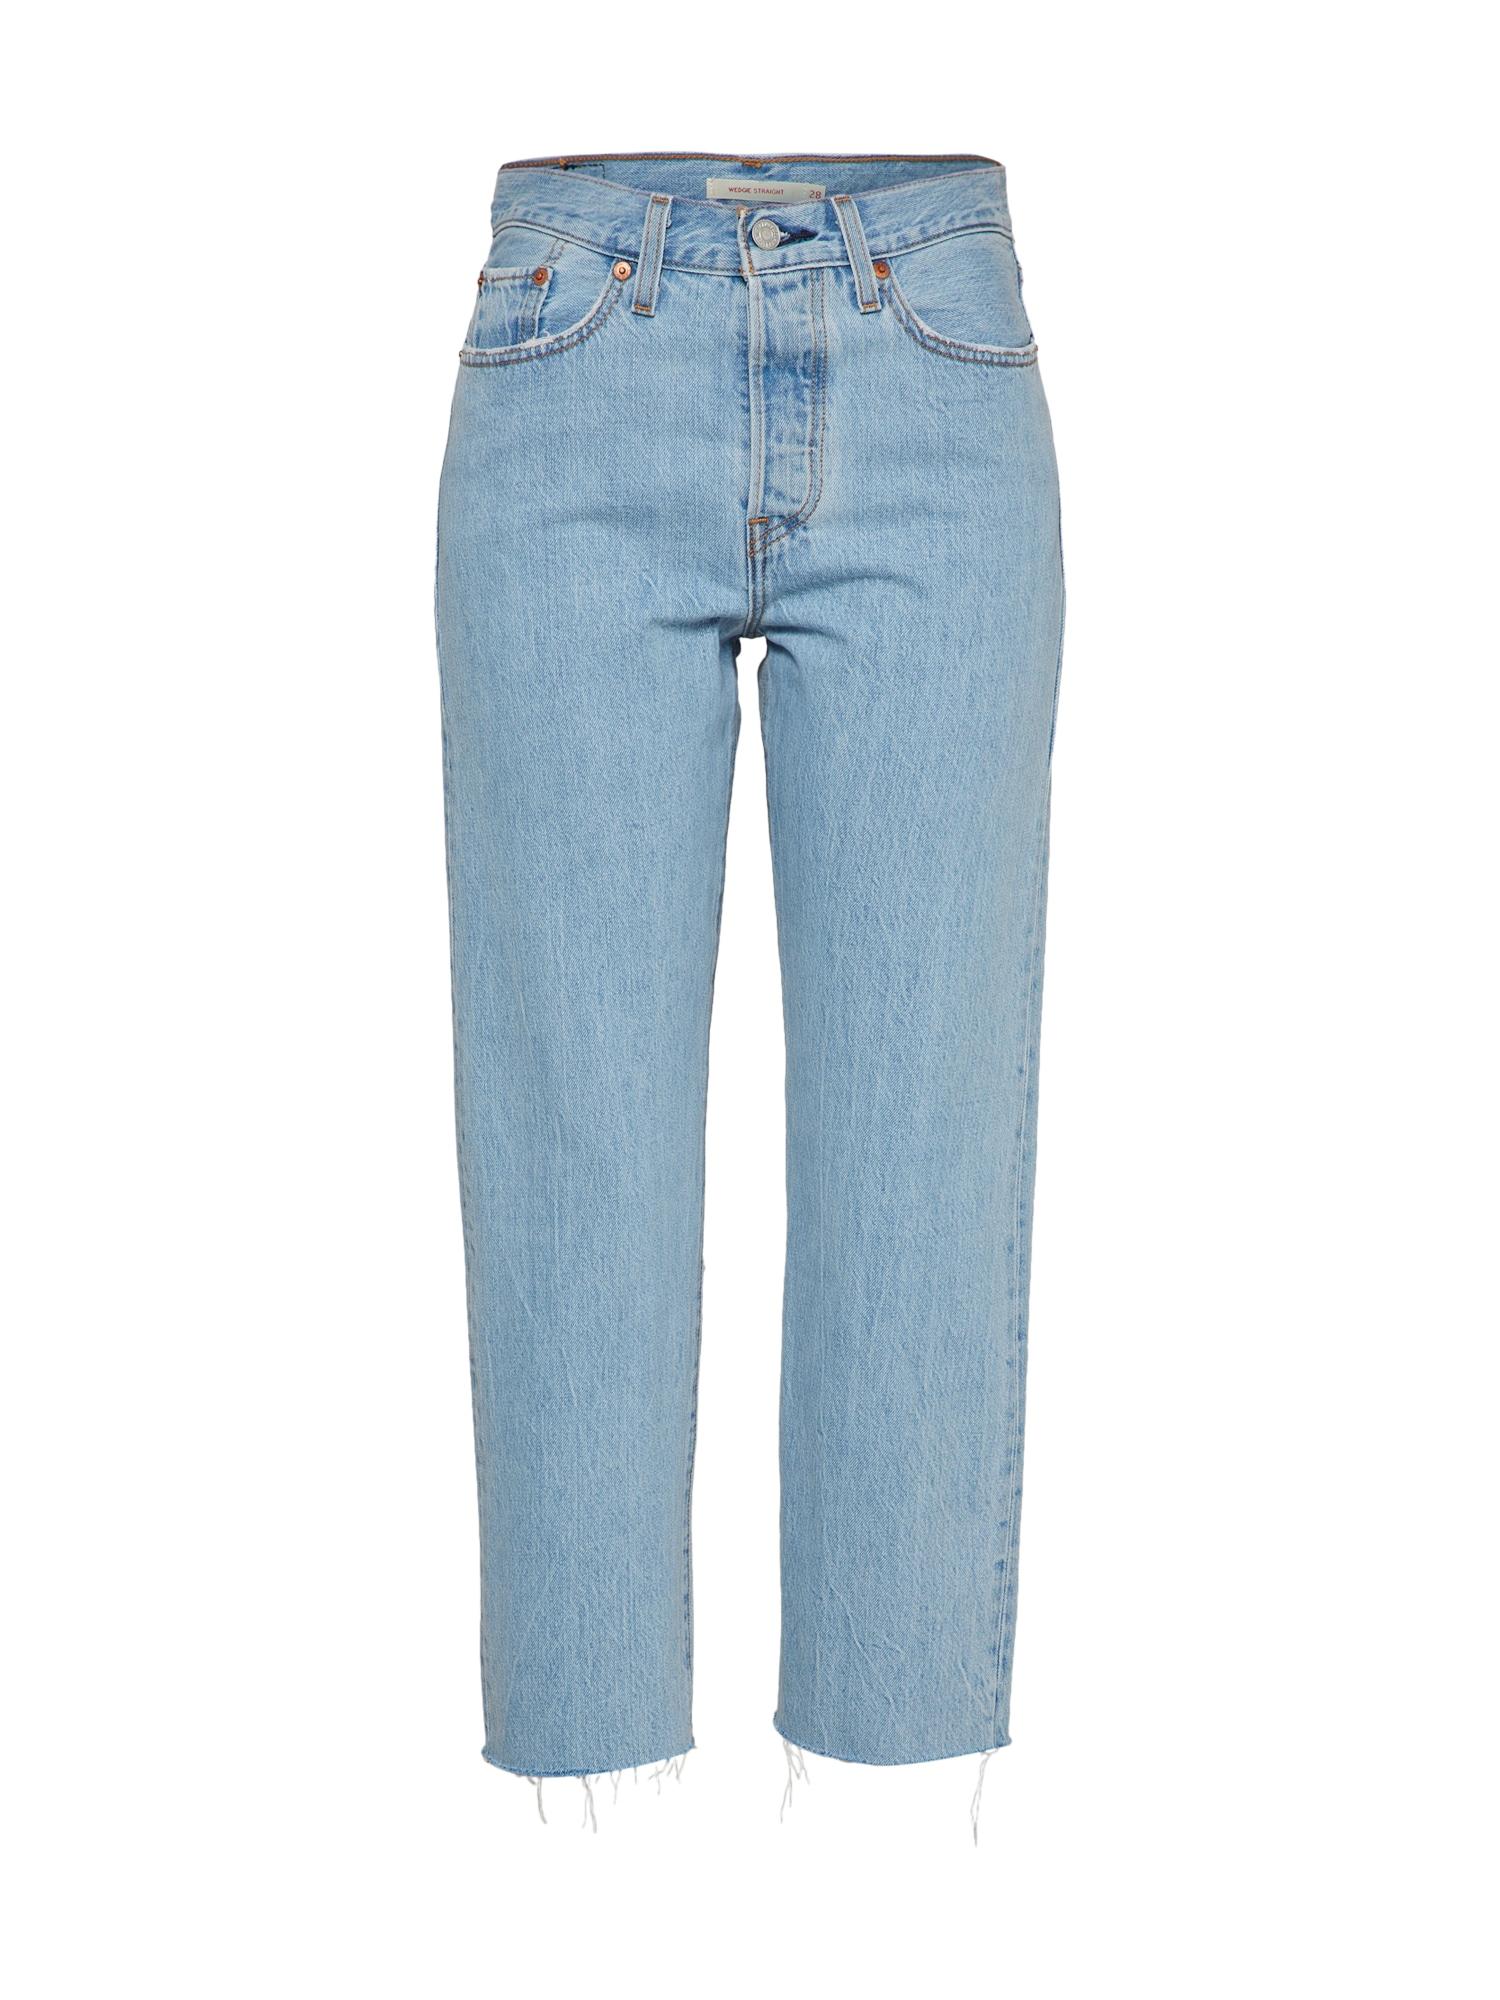 LEVI'S Dames Jeans Wedgie Straight blue denim